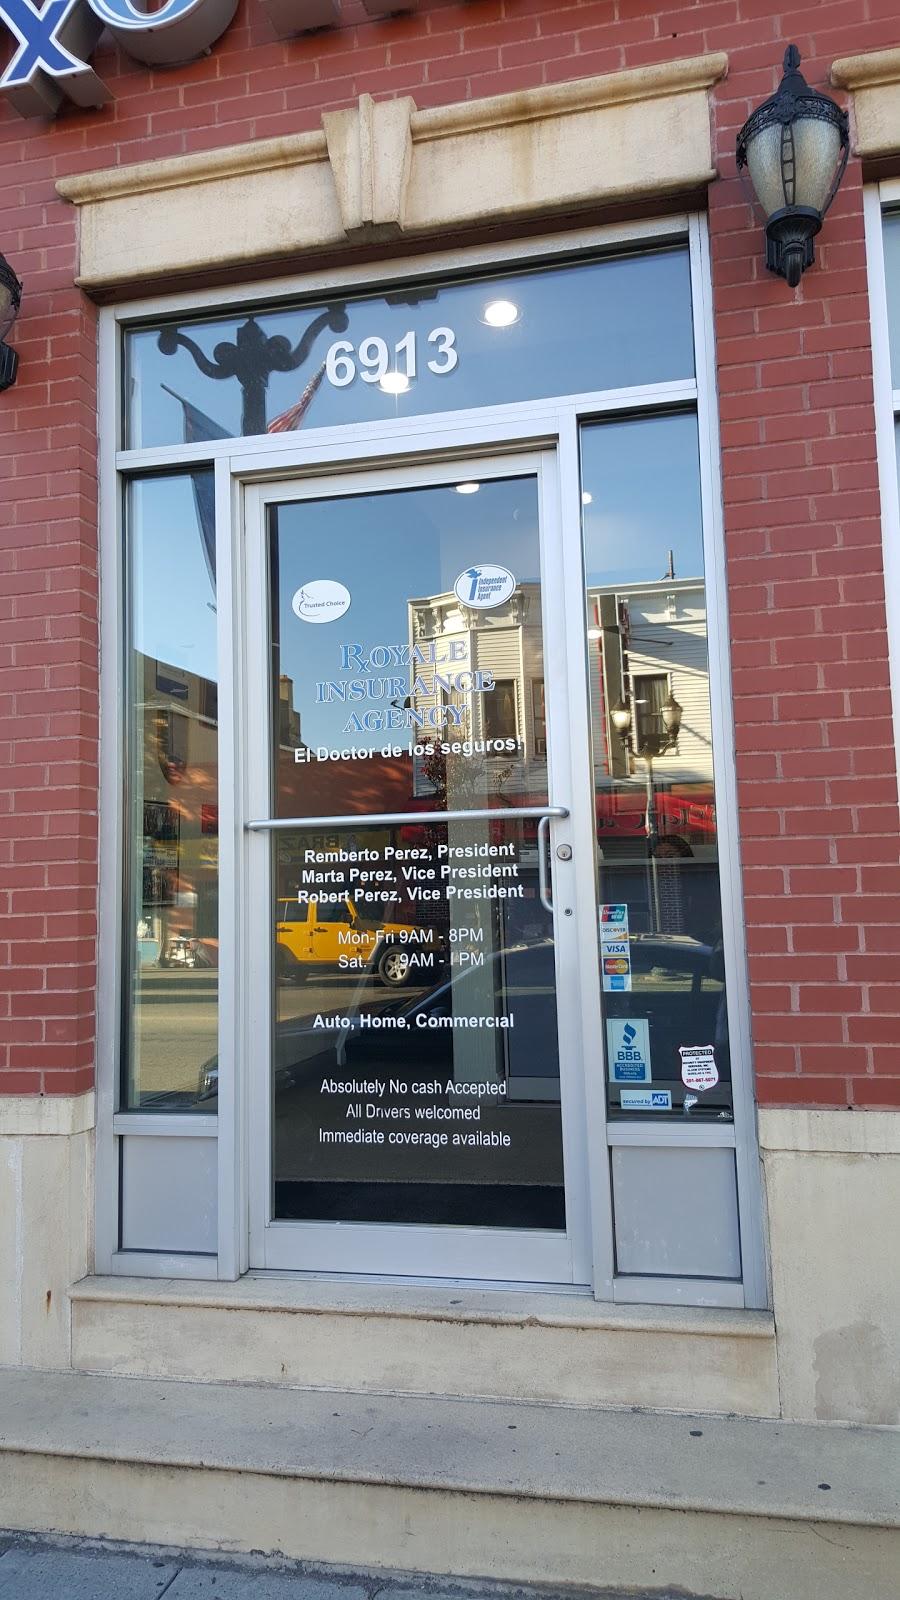 Royale Insurance Agency   insurance agency   6913 Bergenline Ave, Guttenberg, NJ 07093, USA   2018687800 OR +1 201-868-7800